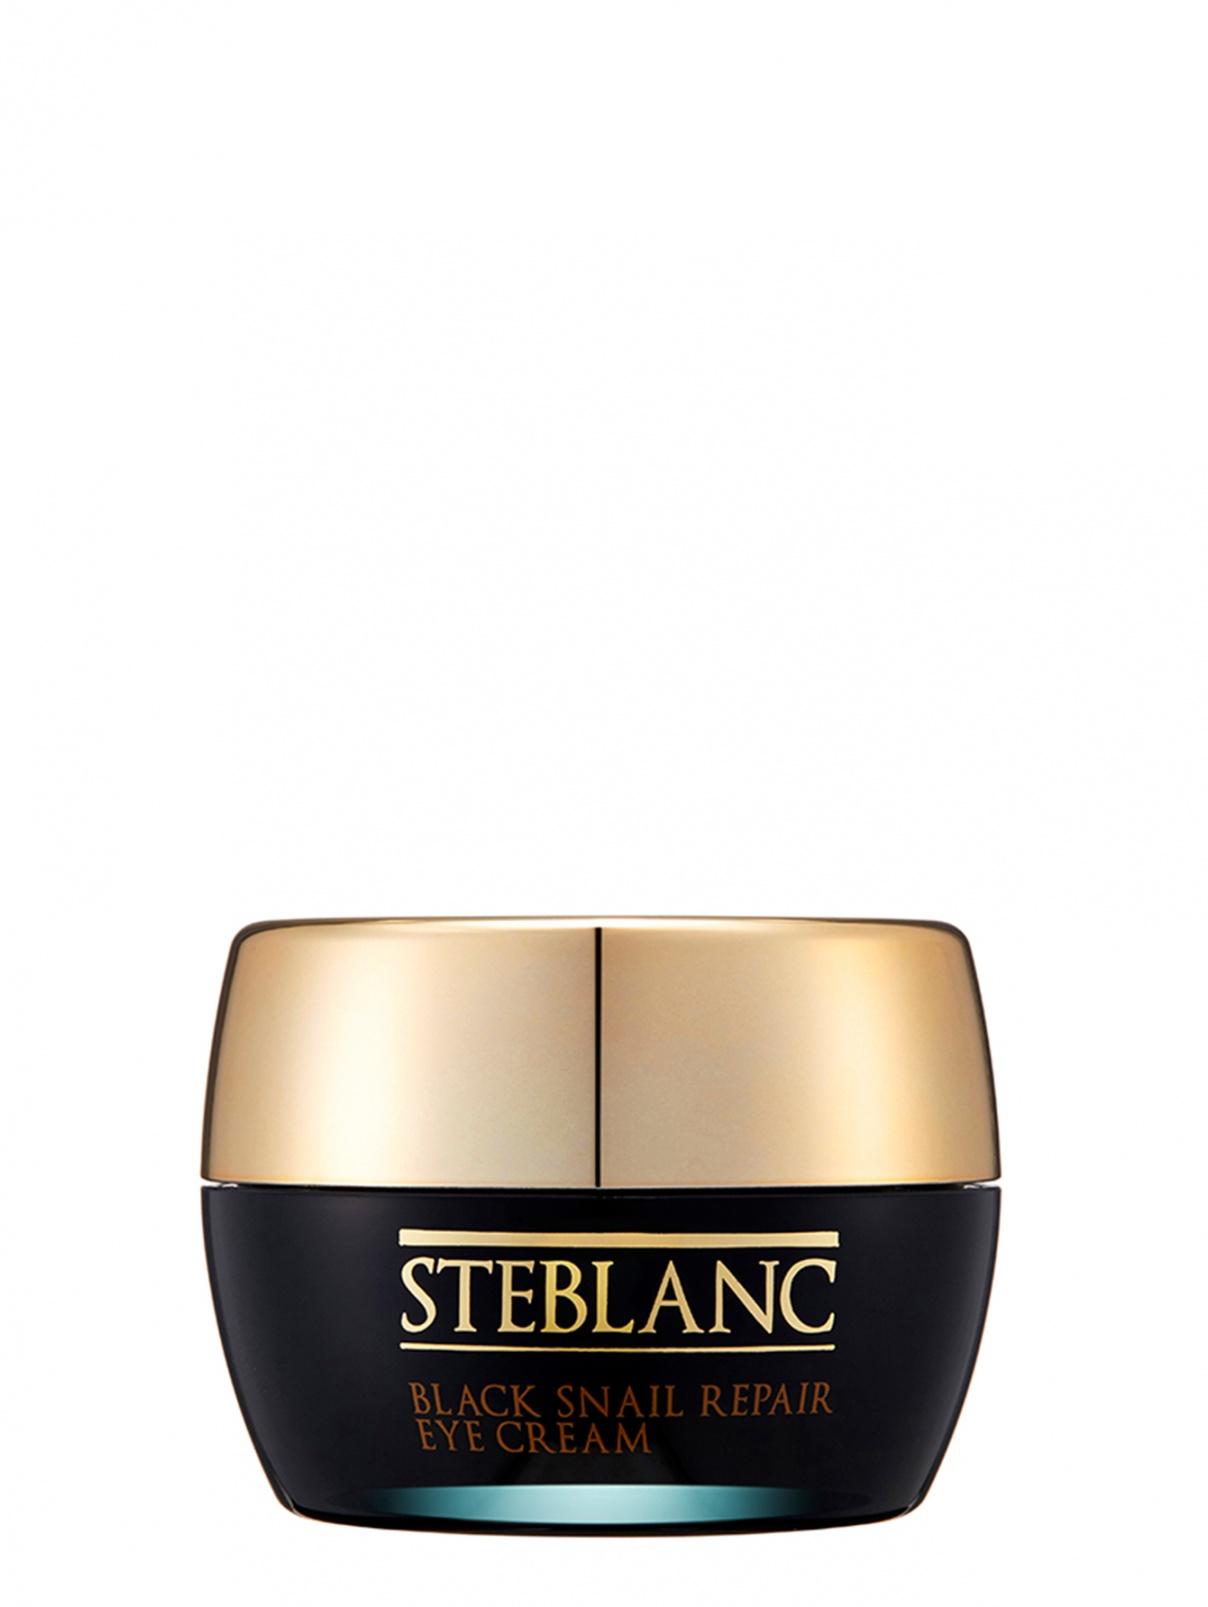 Black Snail Repair Eye Cream / Крем для ухода за кожей вокруг глаз с муцином Черной улитки 35 мл STEBLANK  –  Общий вид